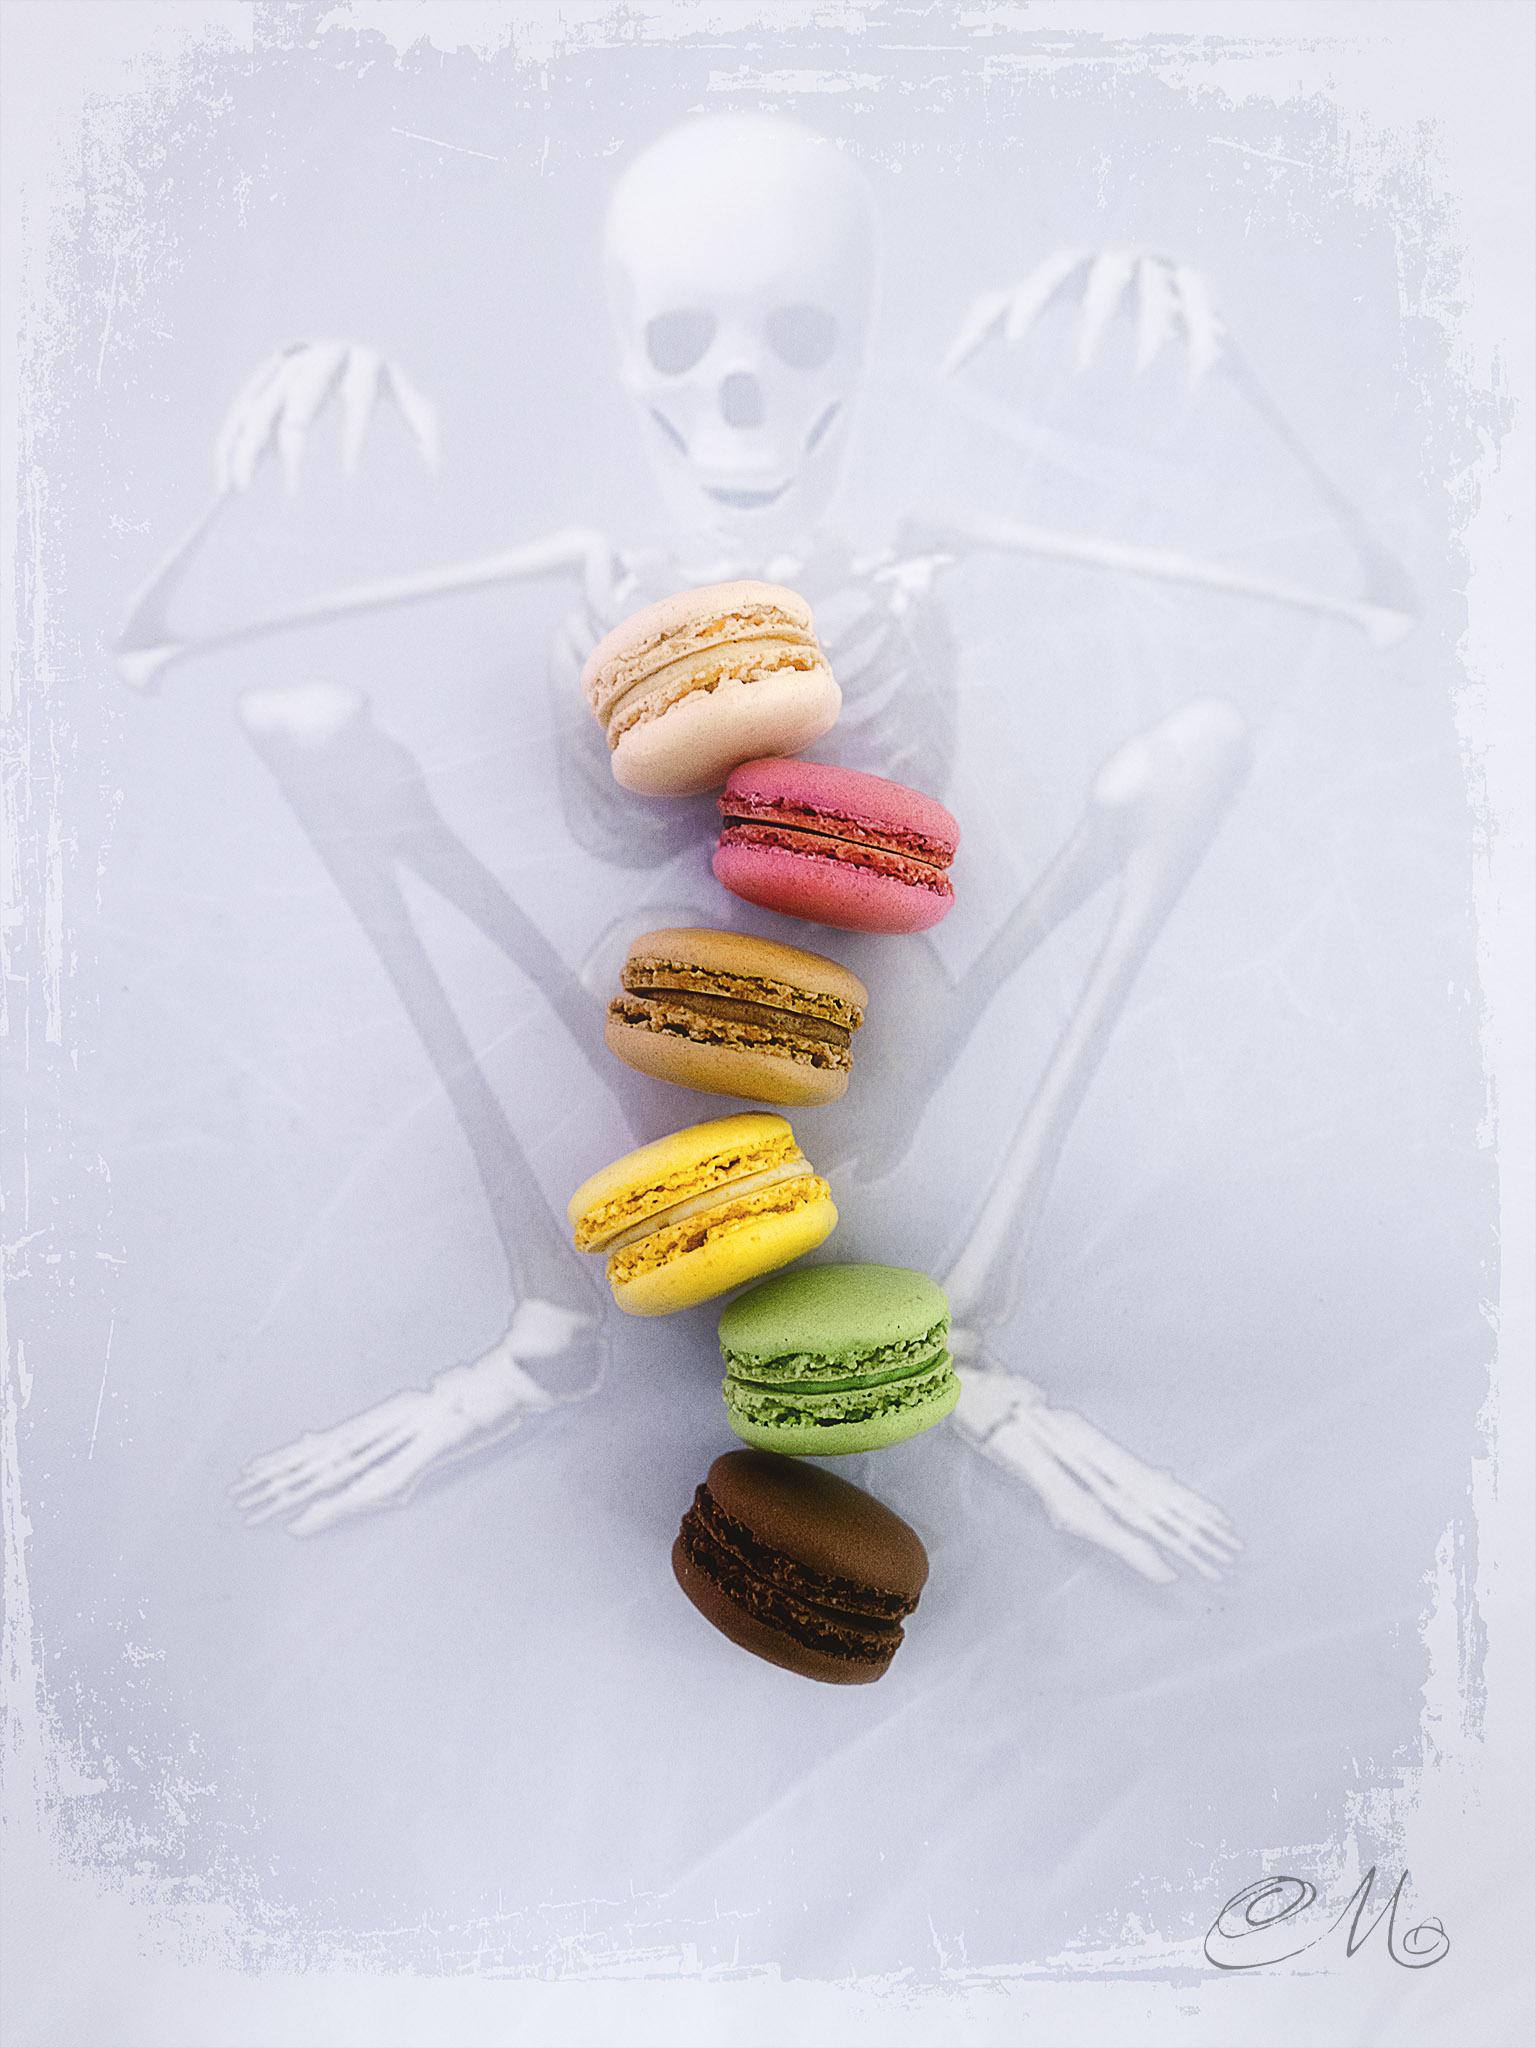 Melinda Isachsen JANIS Photography & Fine Art Skeleton & Macarons